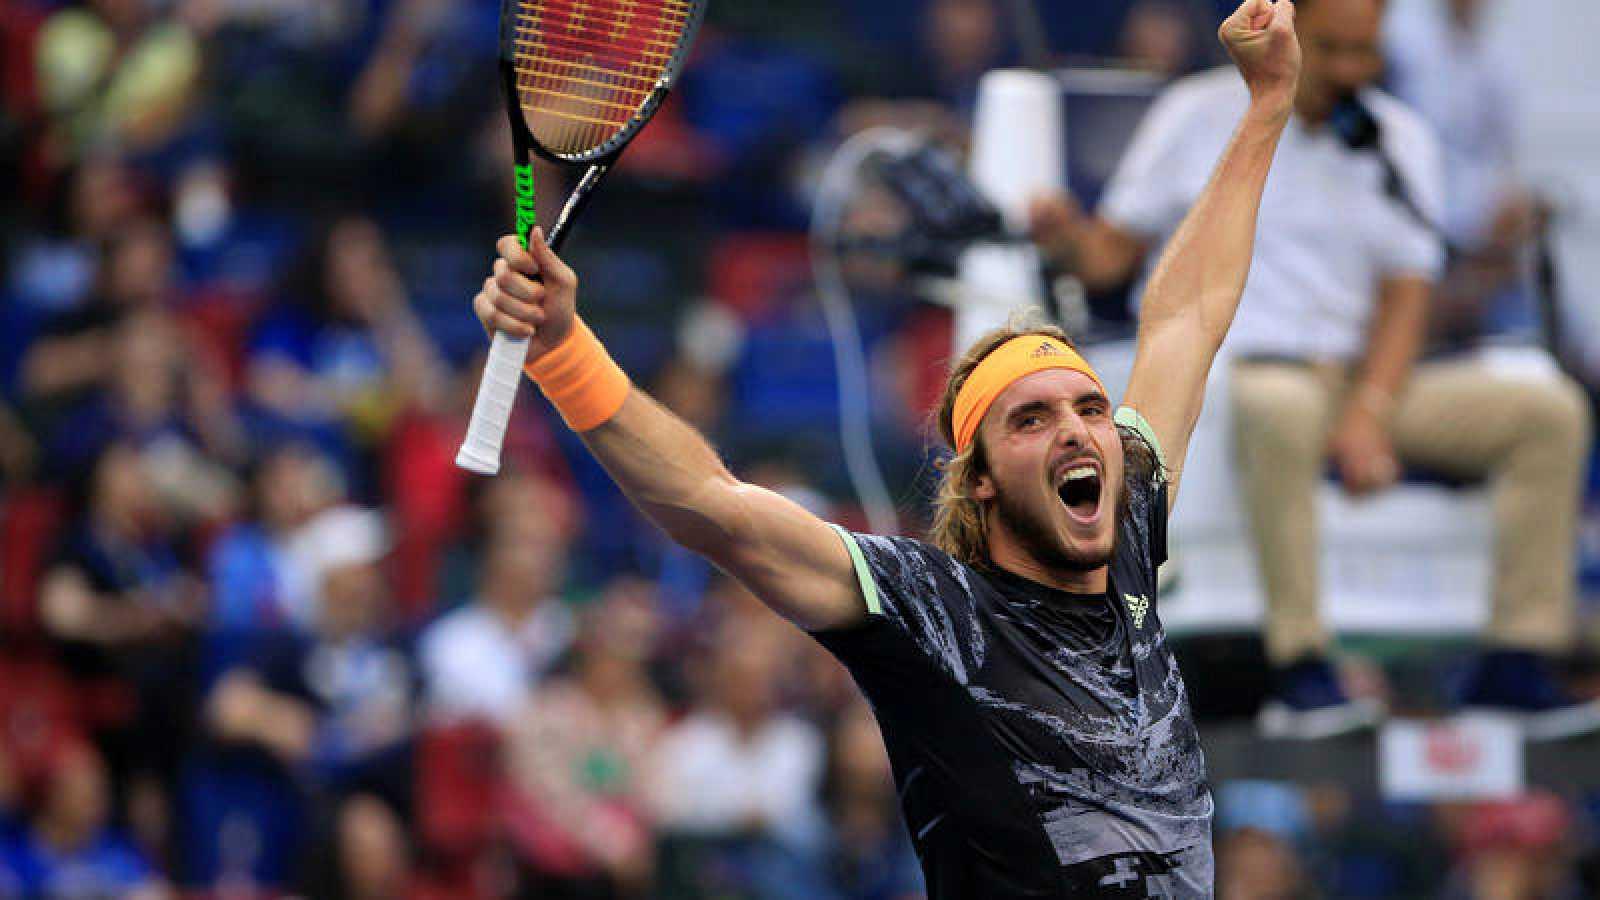 Imagen del griego Tsitsipas tras vencer a Djokovic.